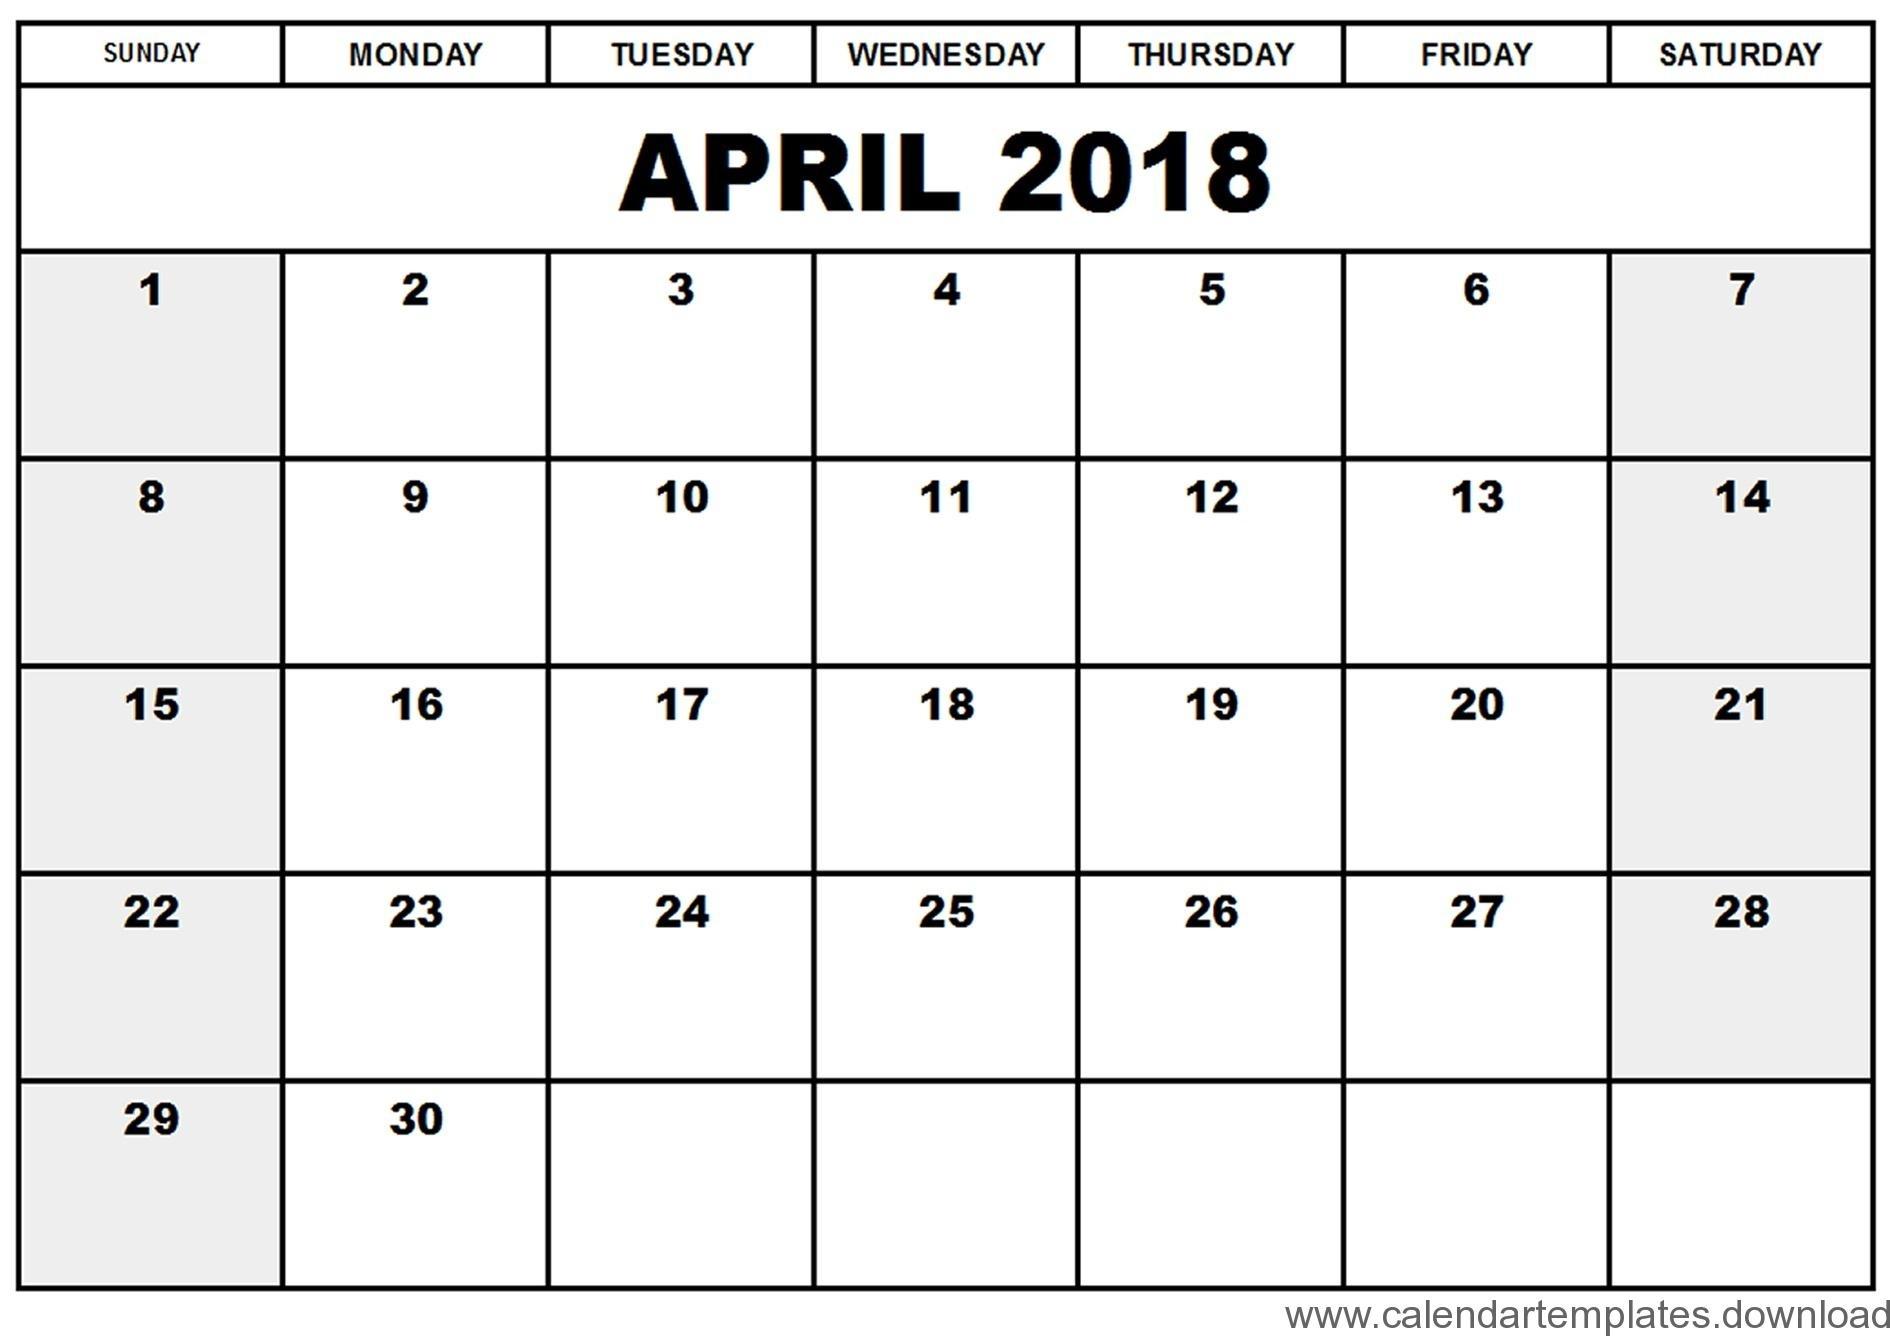 Free Blank Calendar Templates 2018 - Yeniscale.co  Free Blank Calendar Templates To Print